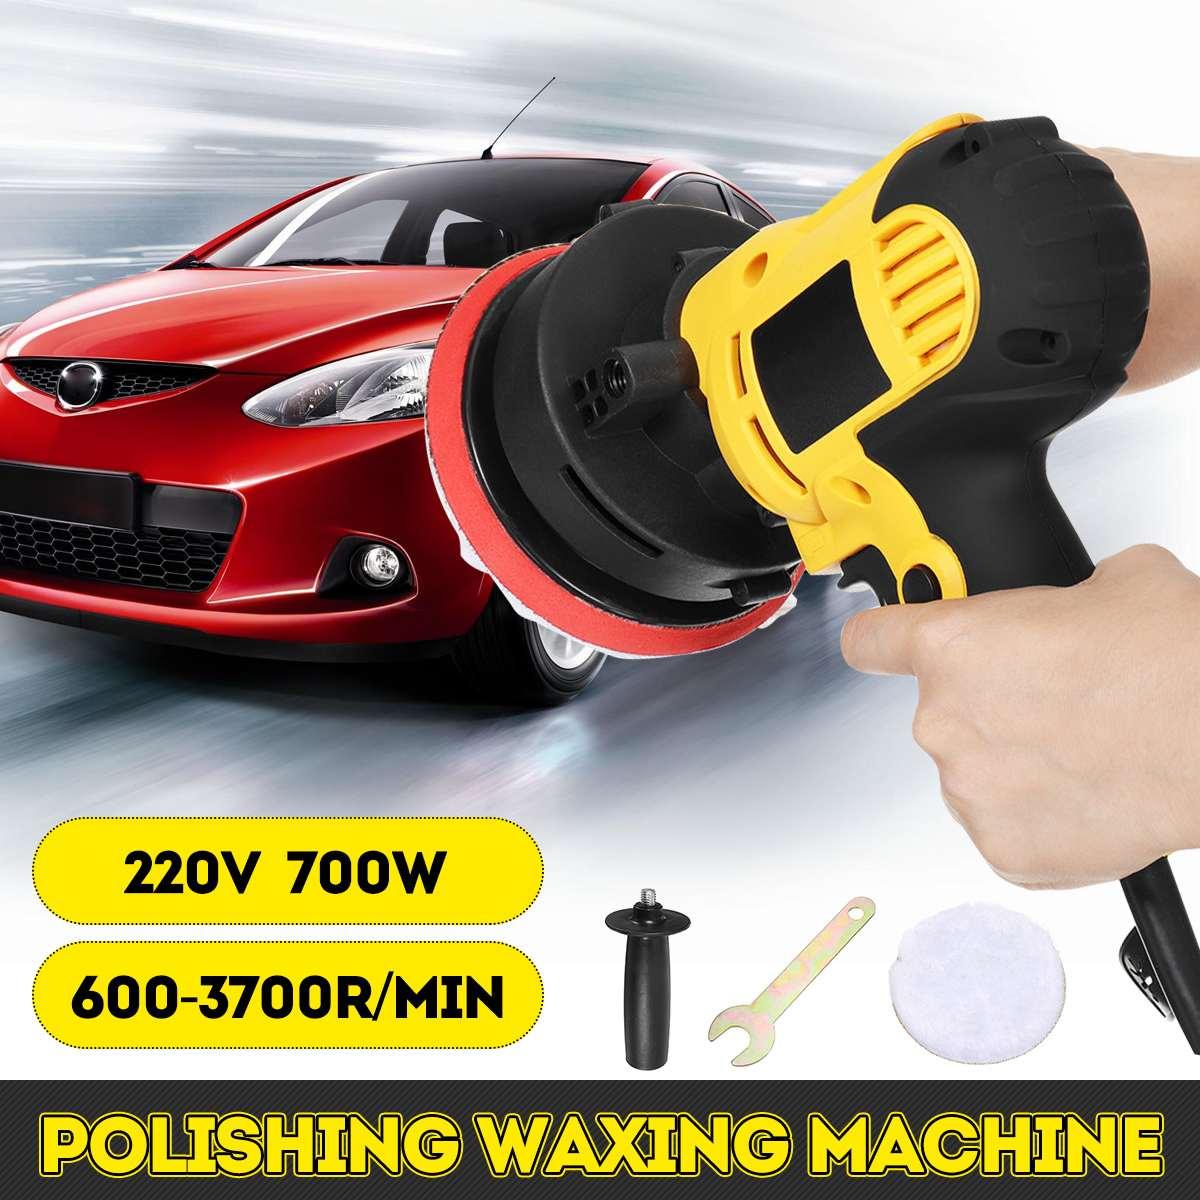 220V 700W Electric Car Polisher Machine Auto Polishing Machine Adjustable Speed Sanding Waxing Tools Car Accessories Power Tools